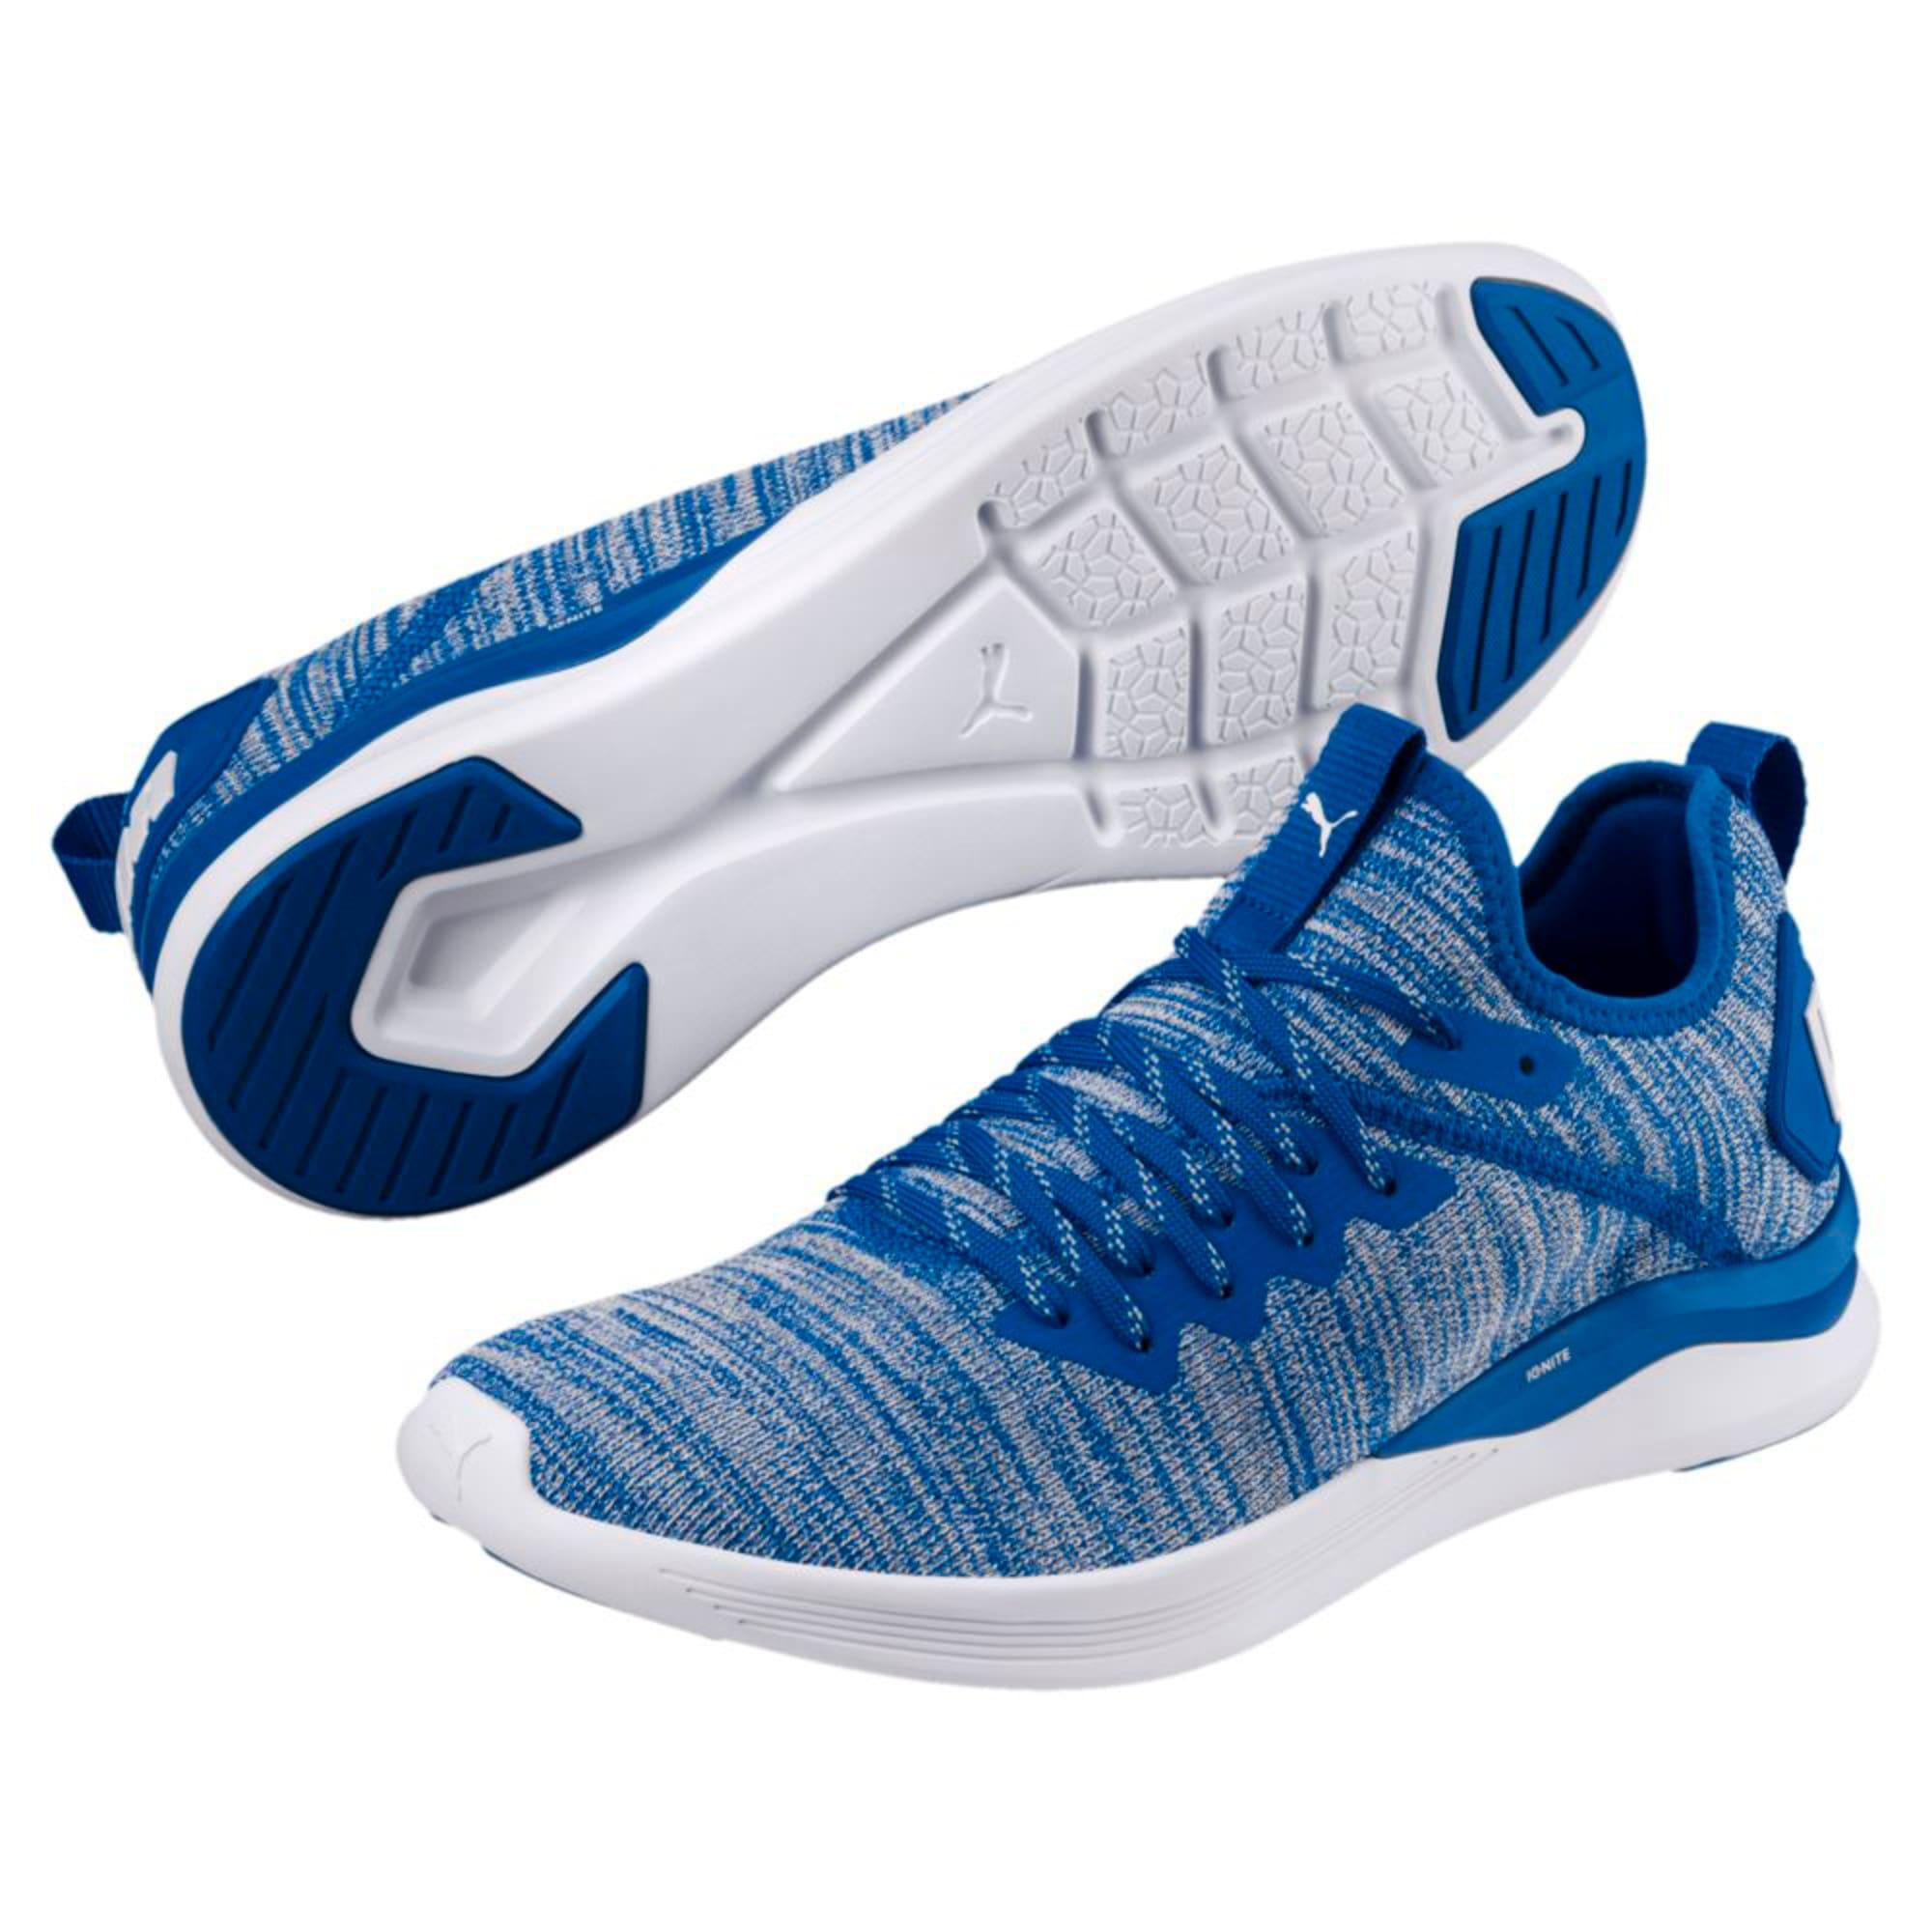 Thumbnail 6 of IGNITE Flash evoKNIT Men's Training Shoes, Strong Blue-White, medium-IND